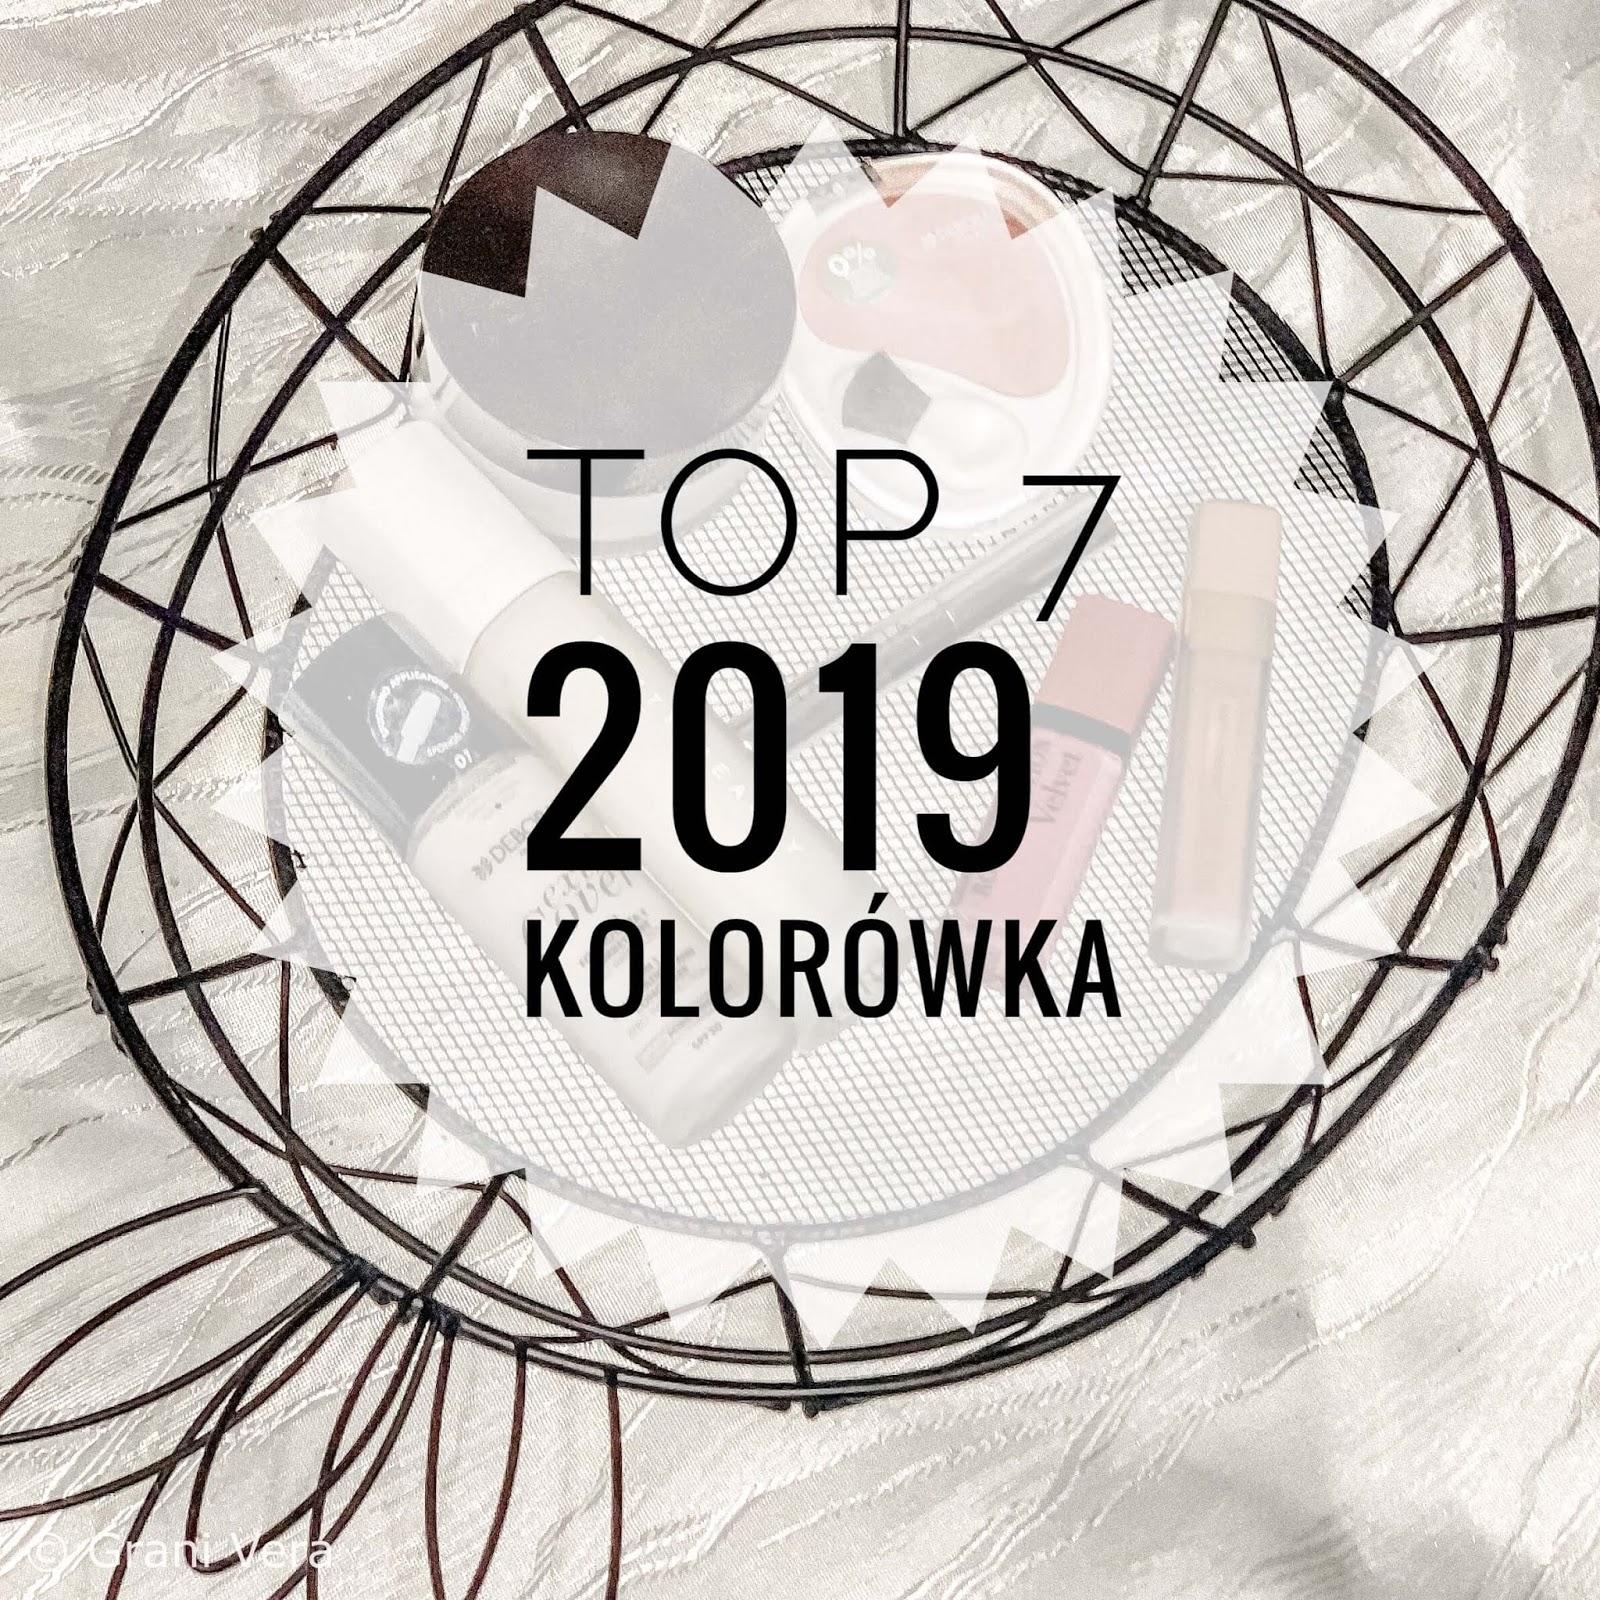 Moje TOP 7 2019 Kolorówka